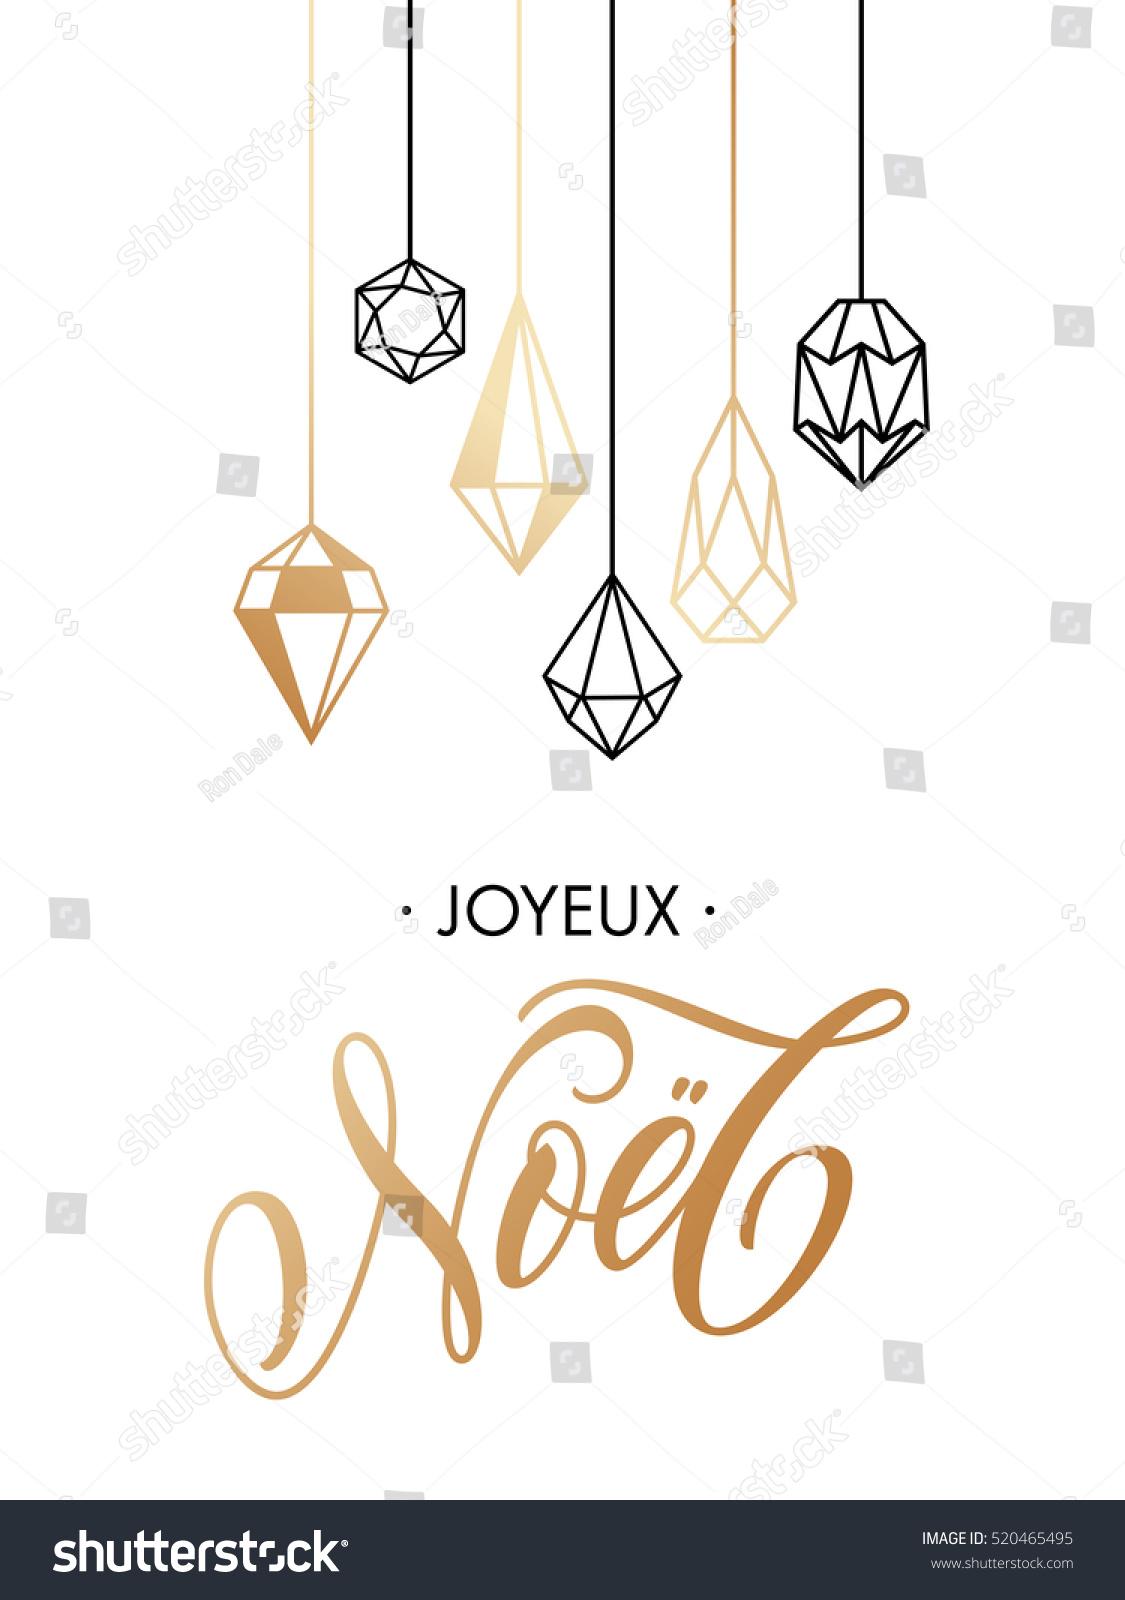 Merry Christmas French Joyeux Noel Gold Stock Vektorgrafik